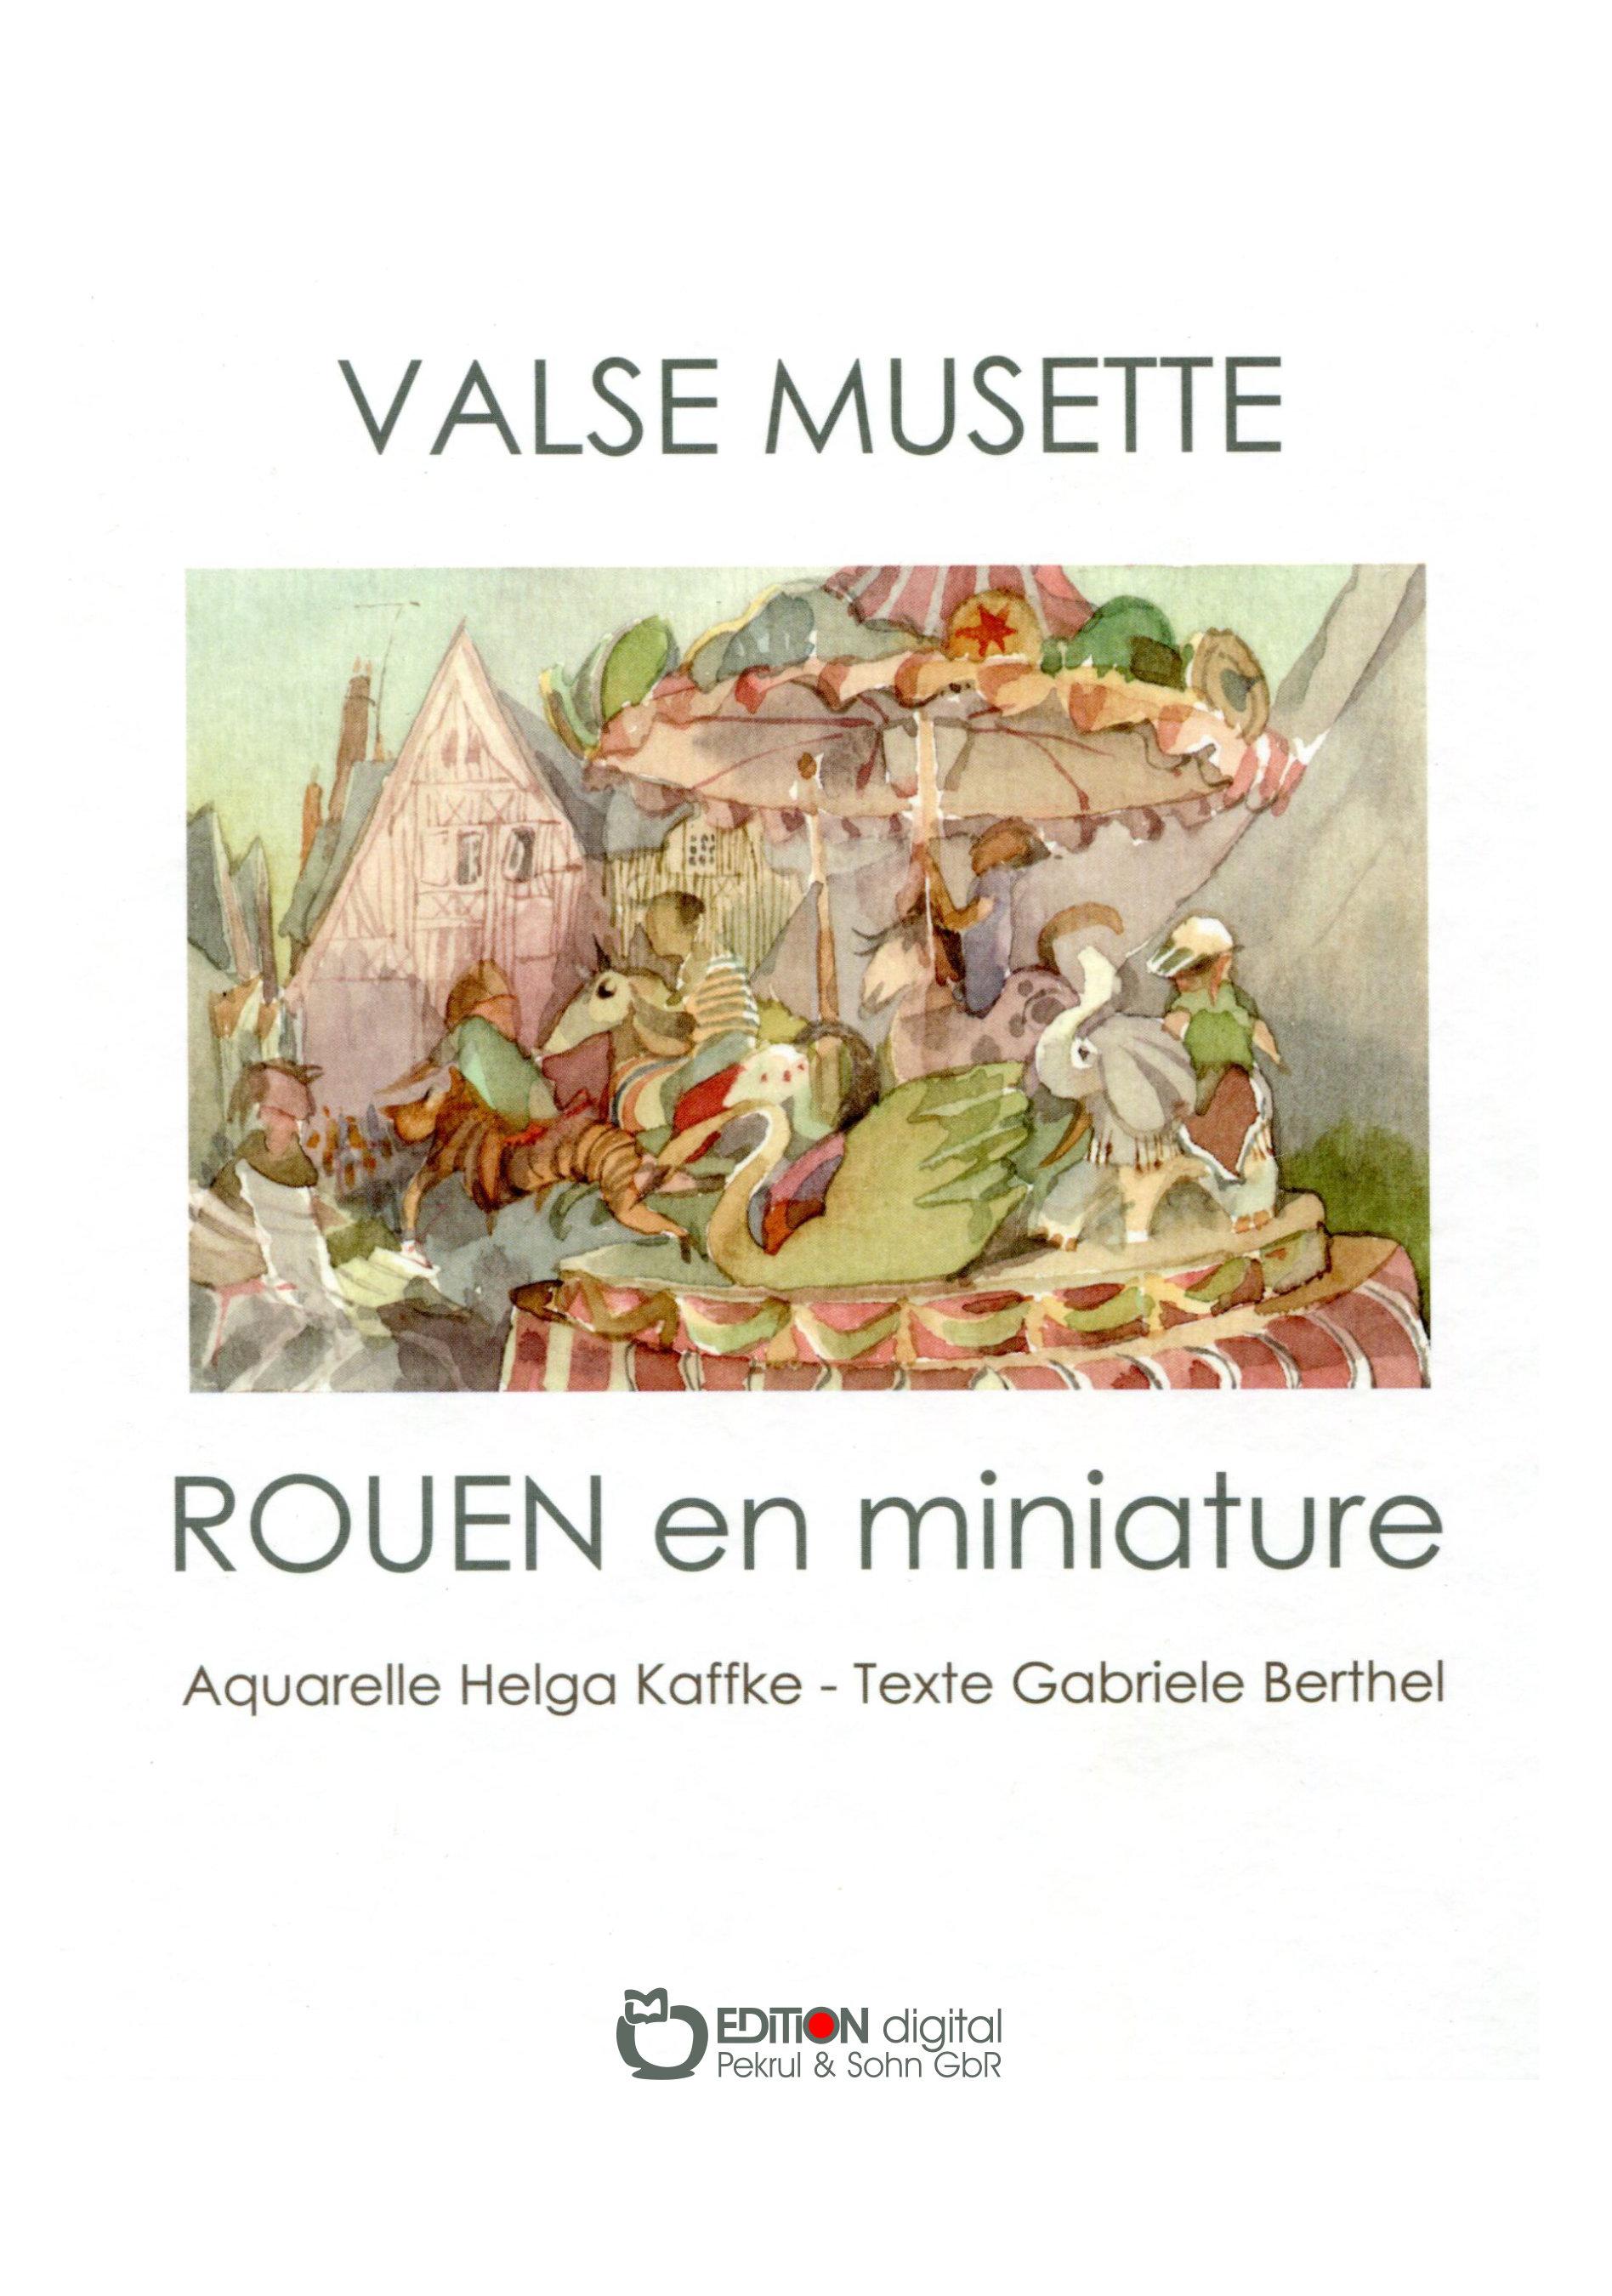 Valse Musette. Rouen en miniature von Gabriele Berthel, Helga Kaffke (Illustrator)